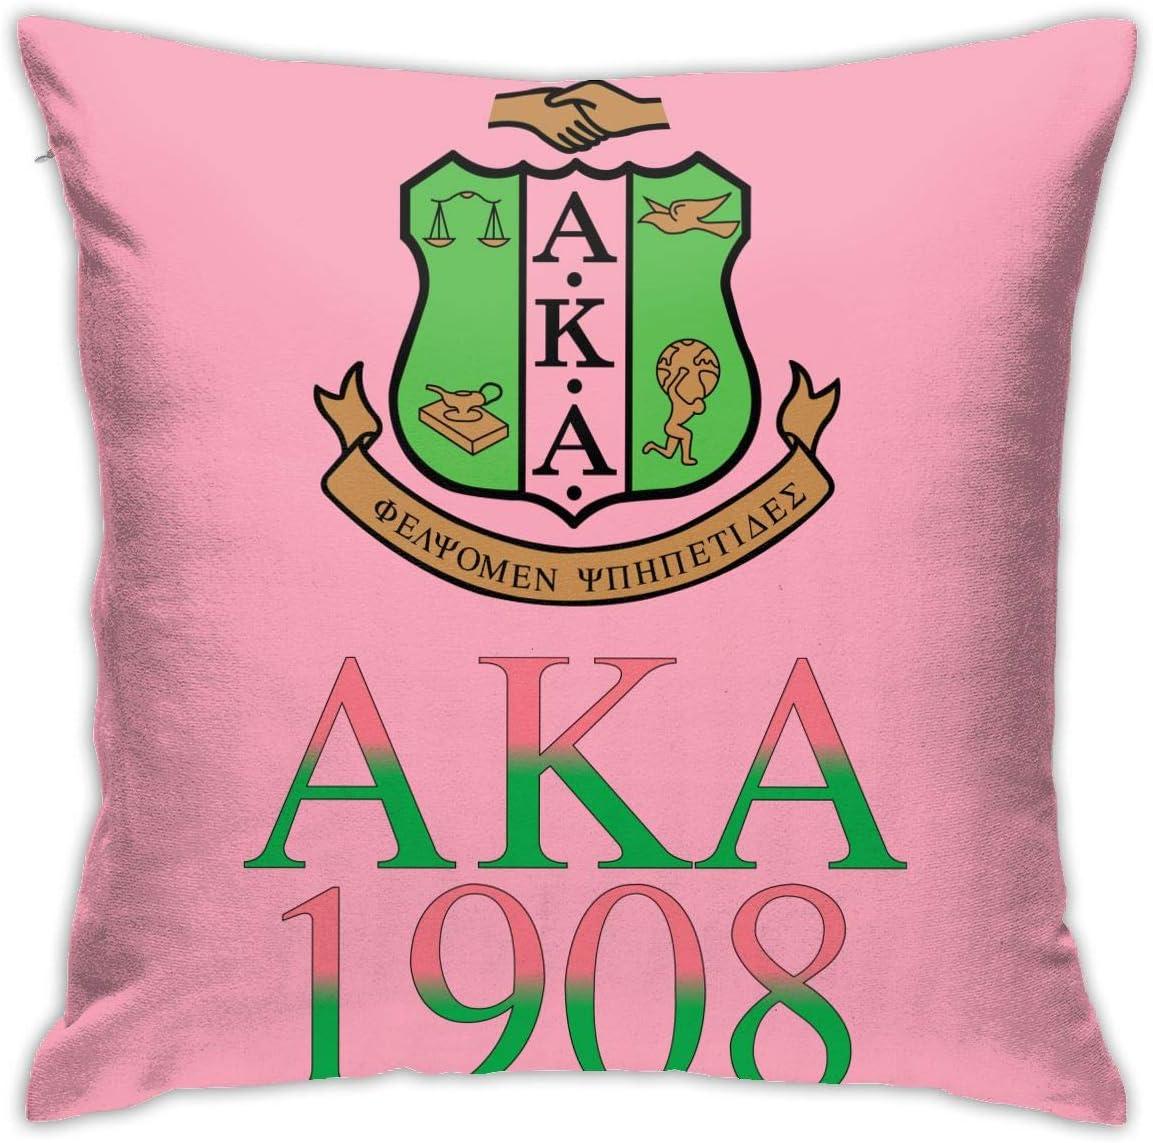 MSFX Alpha Kappa Alpha Throw Pillowcase Pillow Cover 18x18 Inches(45cm) Decor Corduroy Velvet Cushion Cover Handmade Decorative